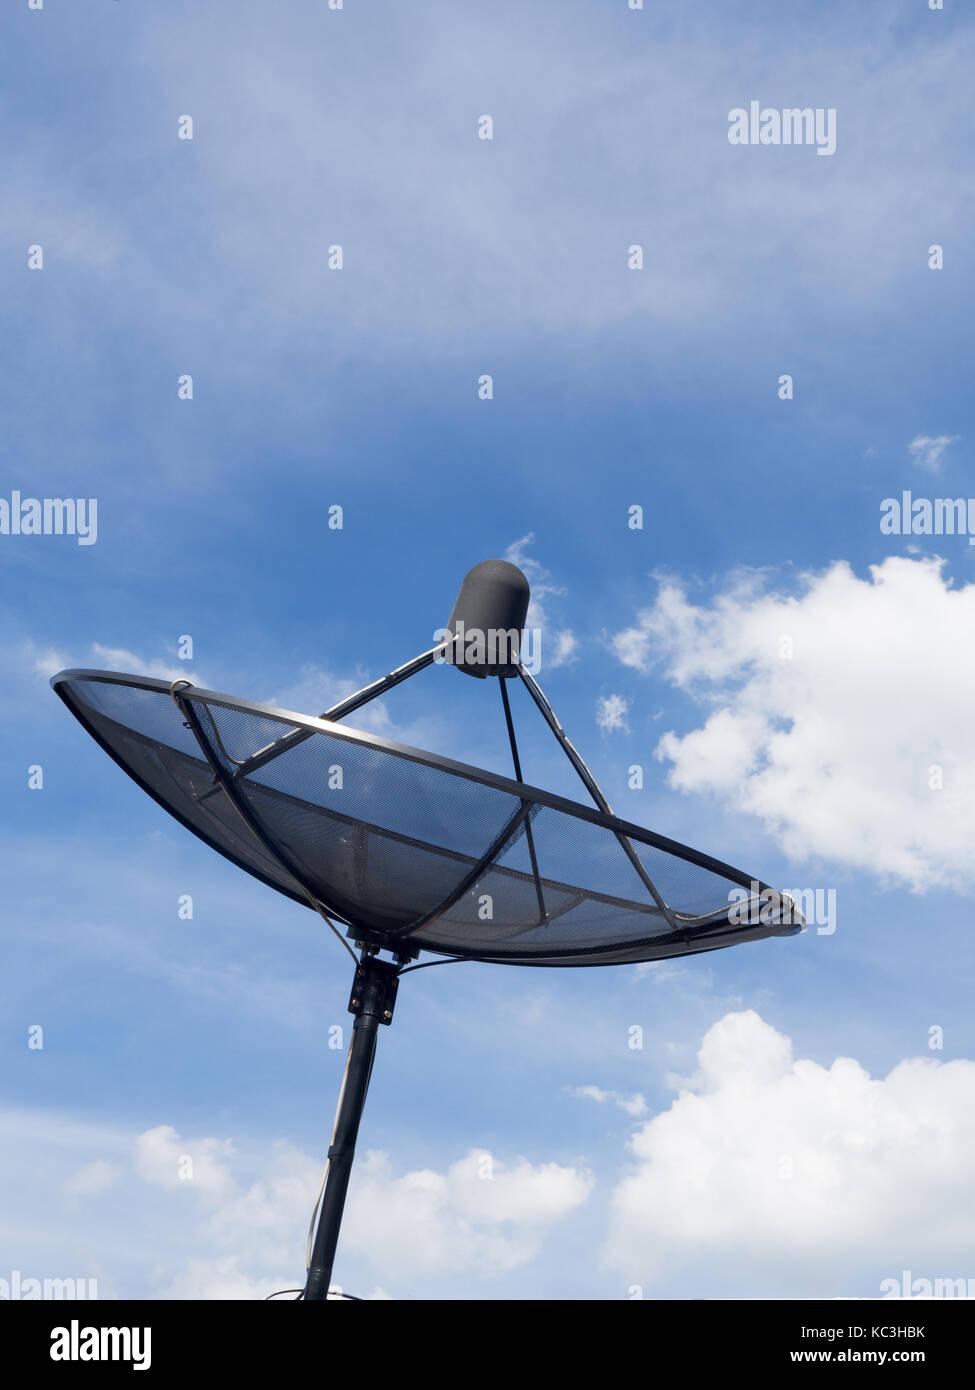 Cable tv antennas stock photos cable tv antennas stock - Cable antena satelite ...